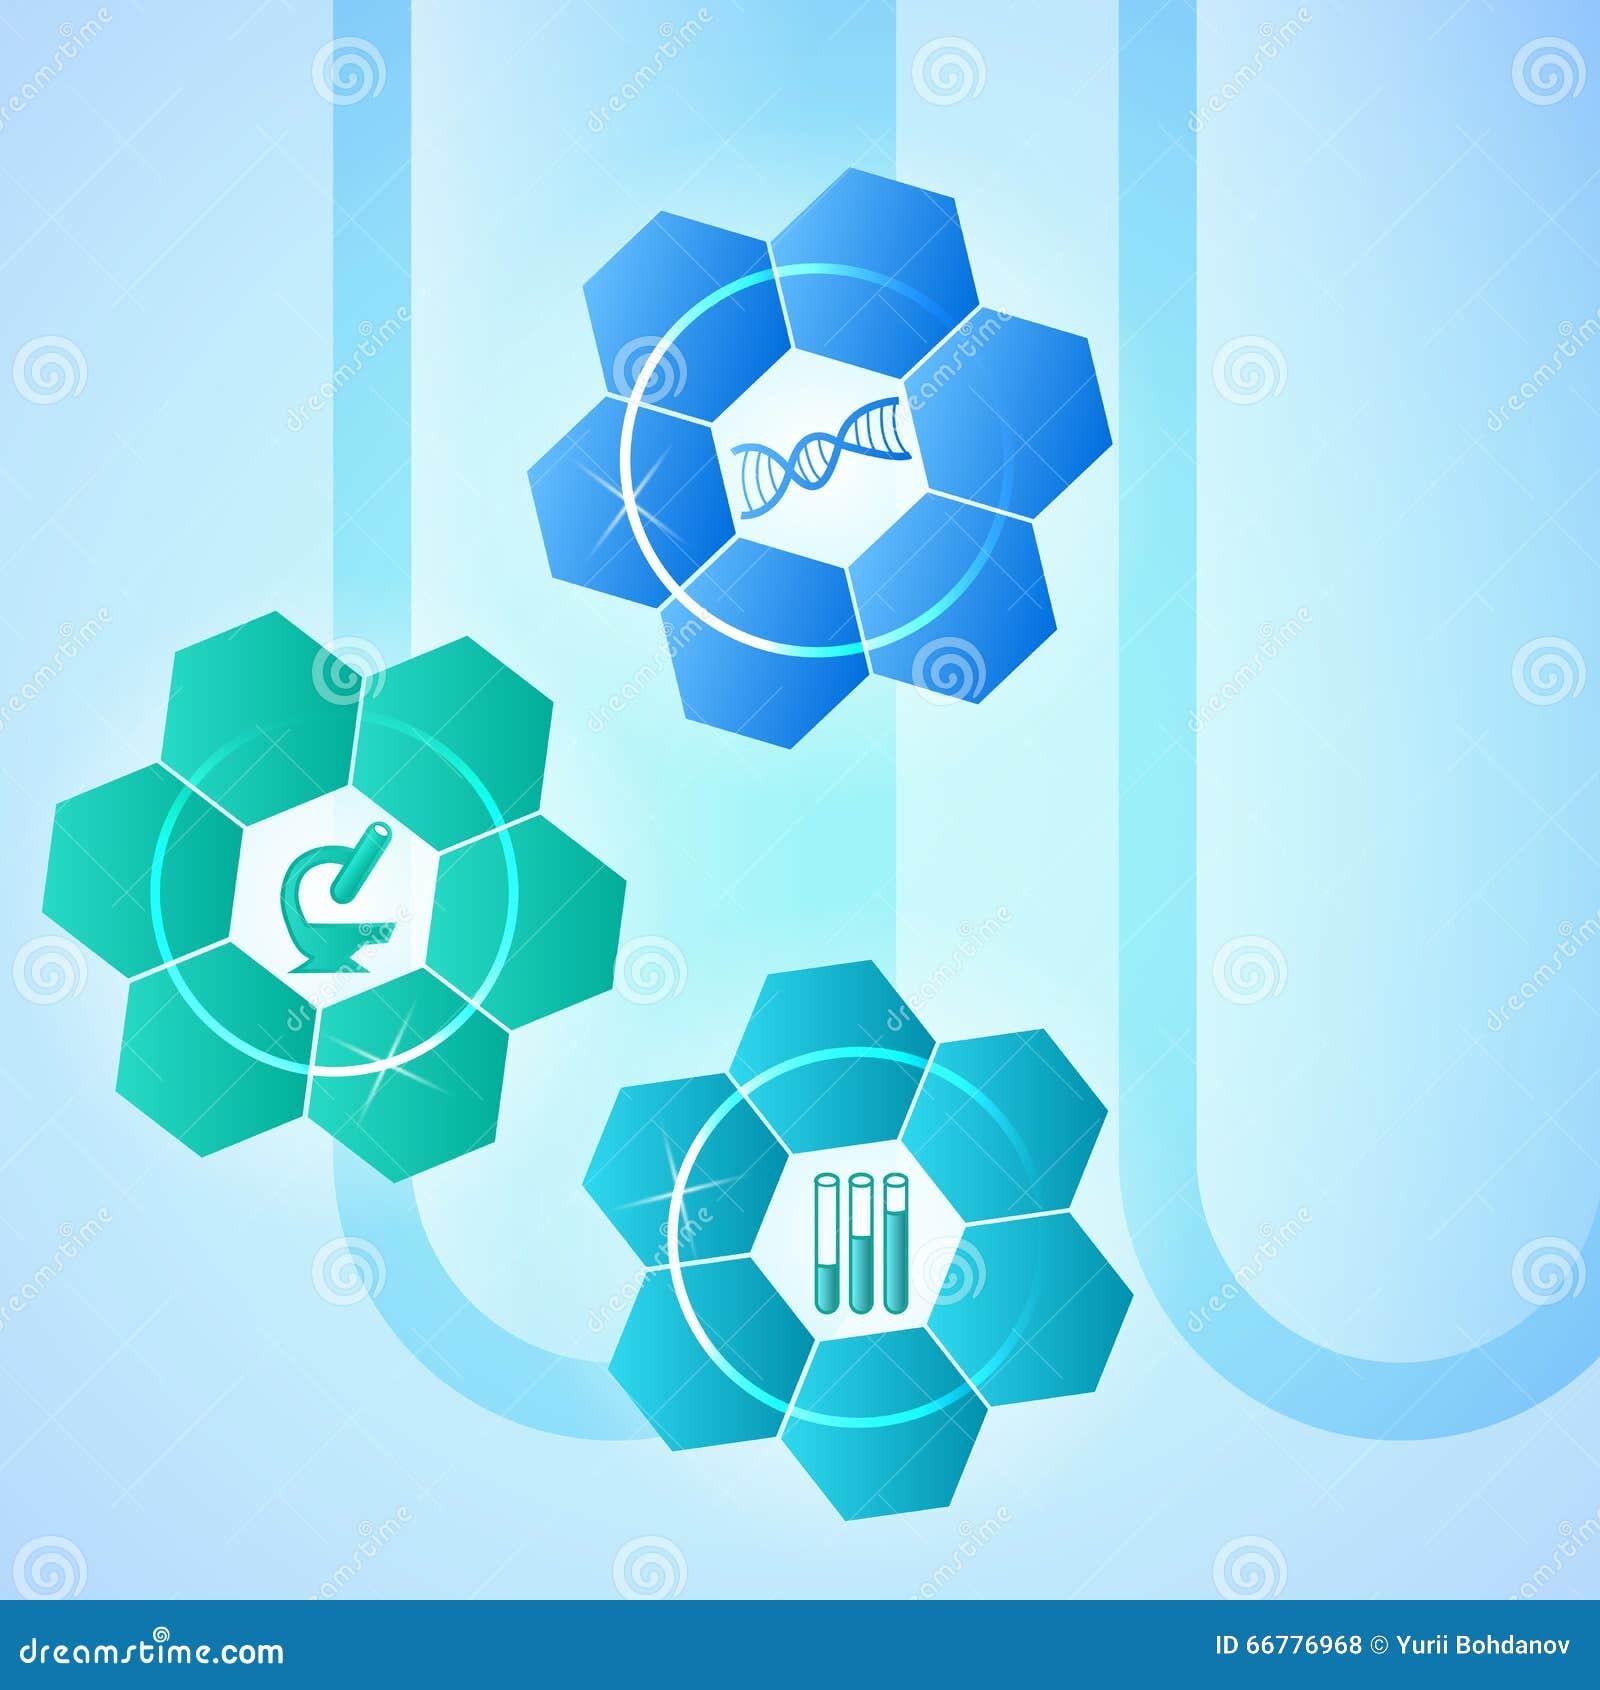 Science Laboratory Background Design: Brochure Template Concept Techno Flower Medical Laboratory